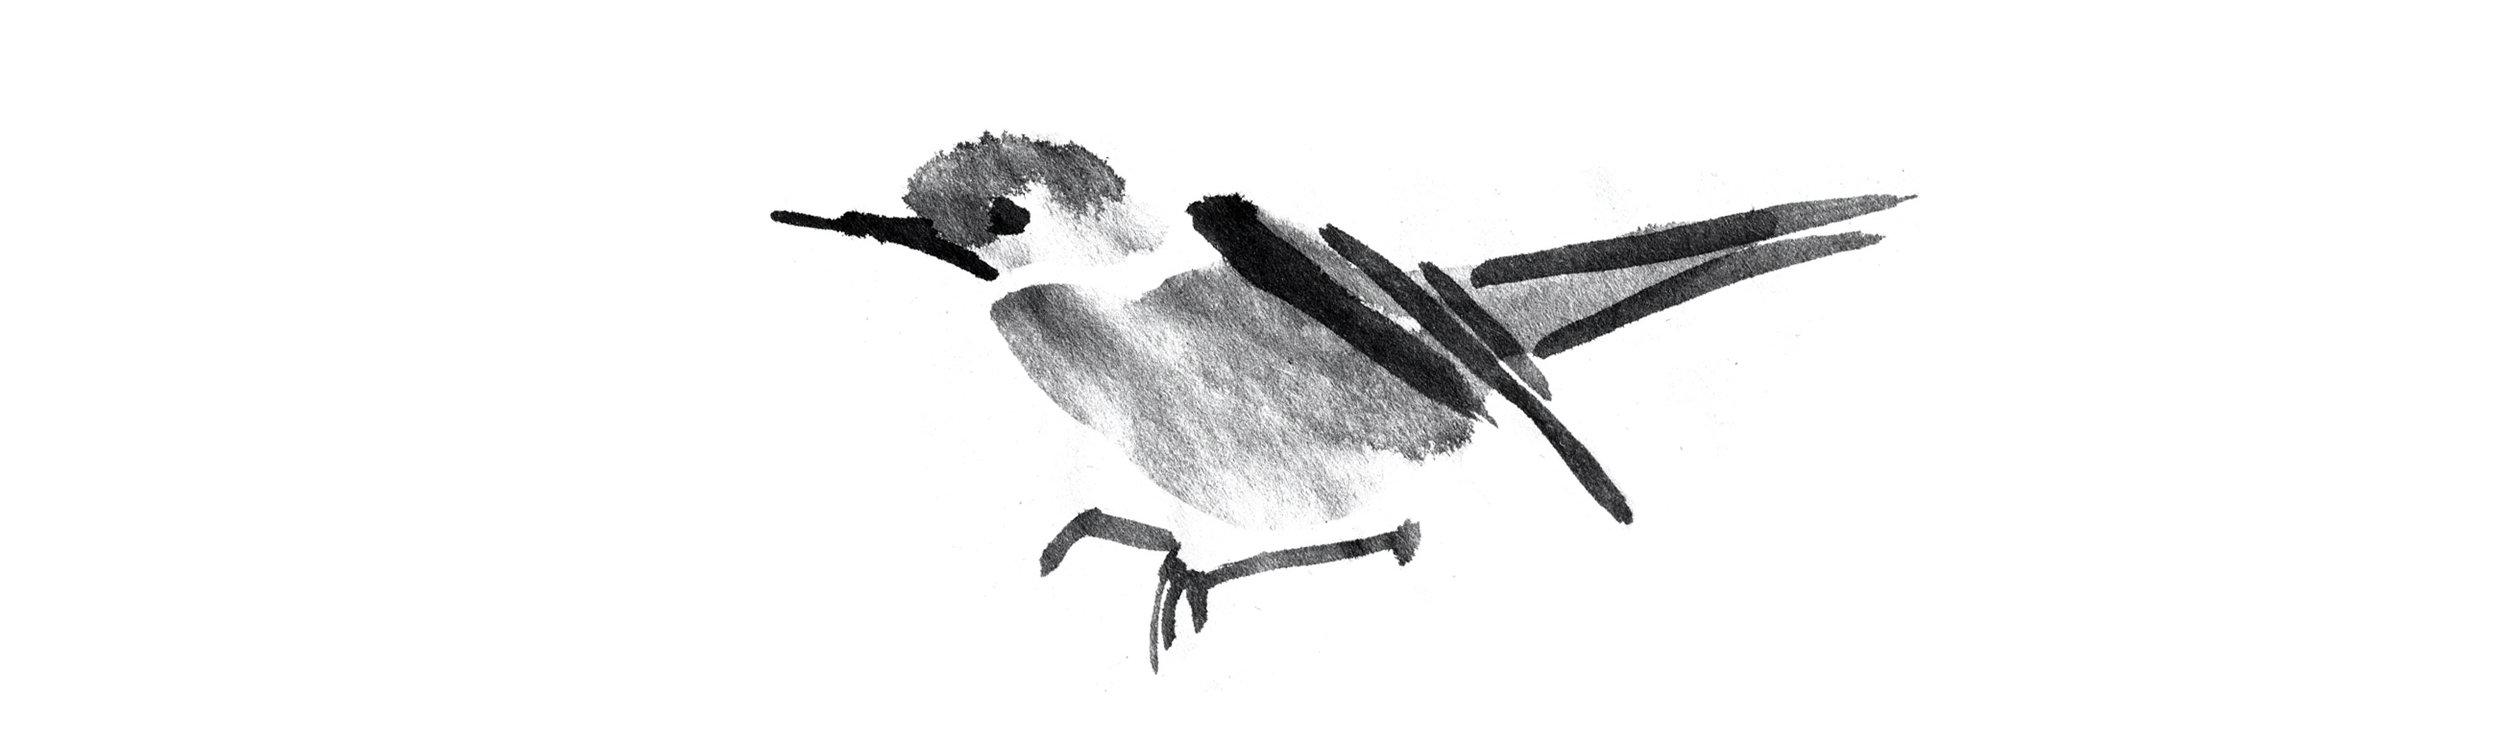 birds breaker.jpg